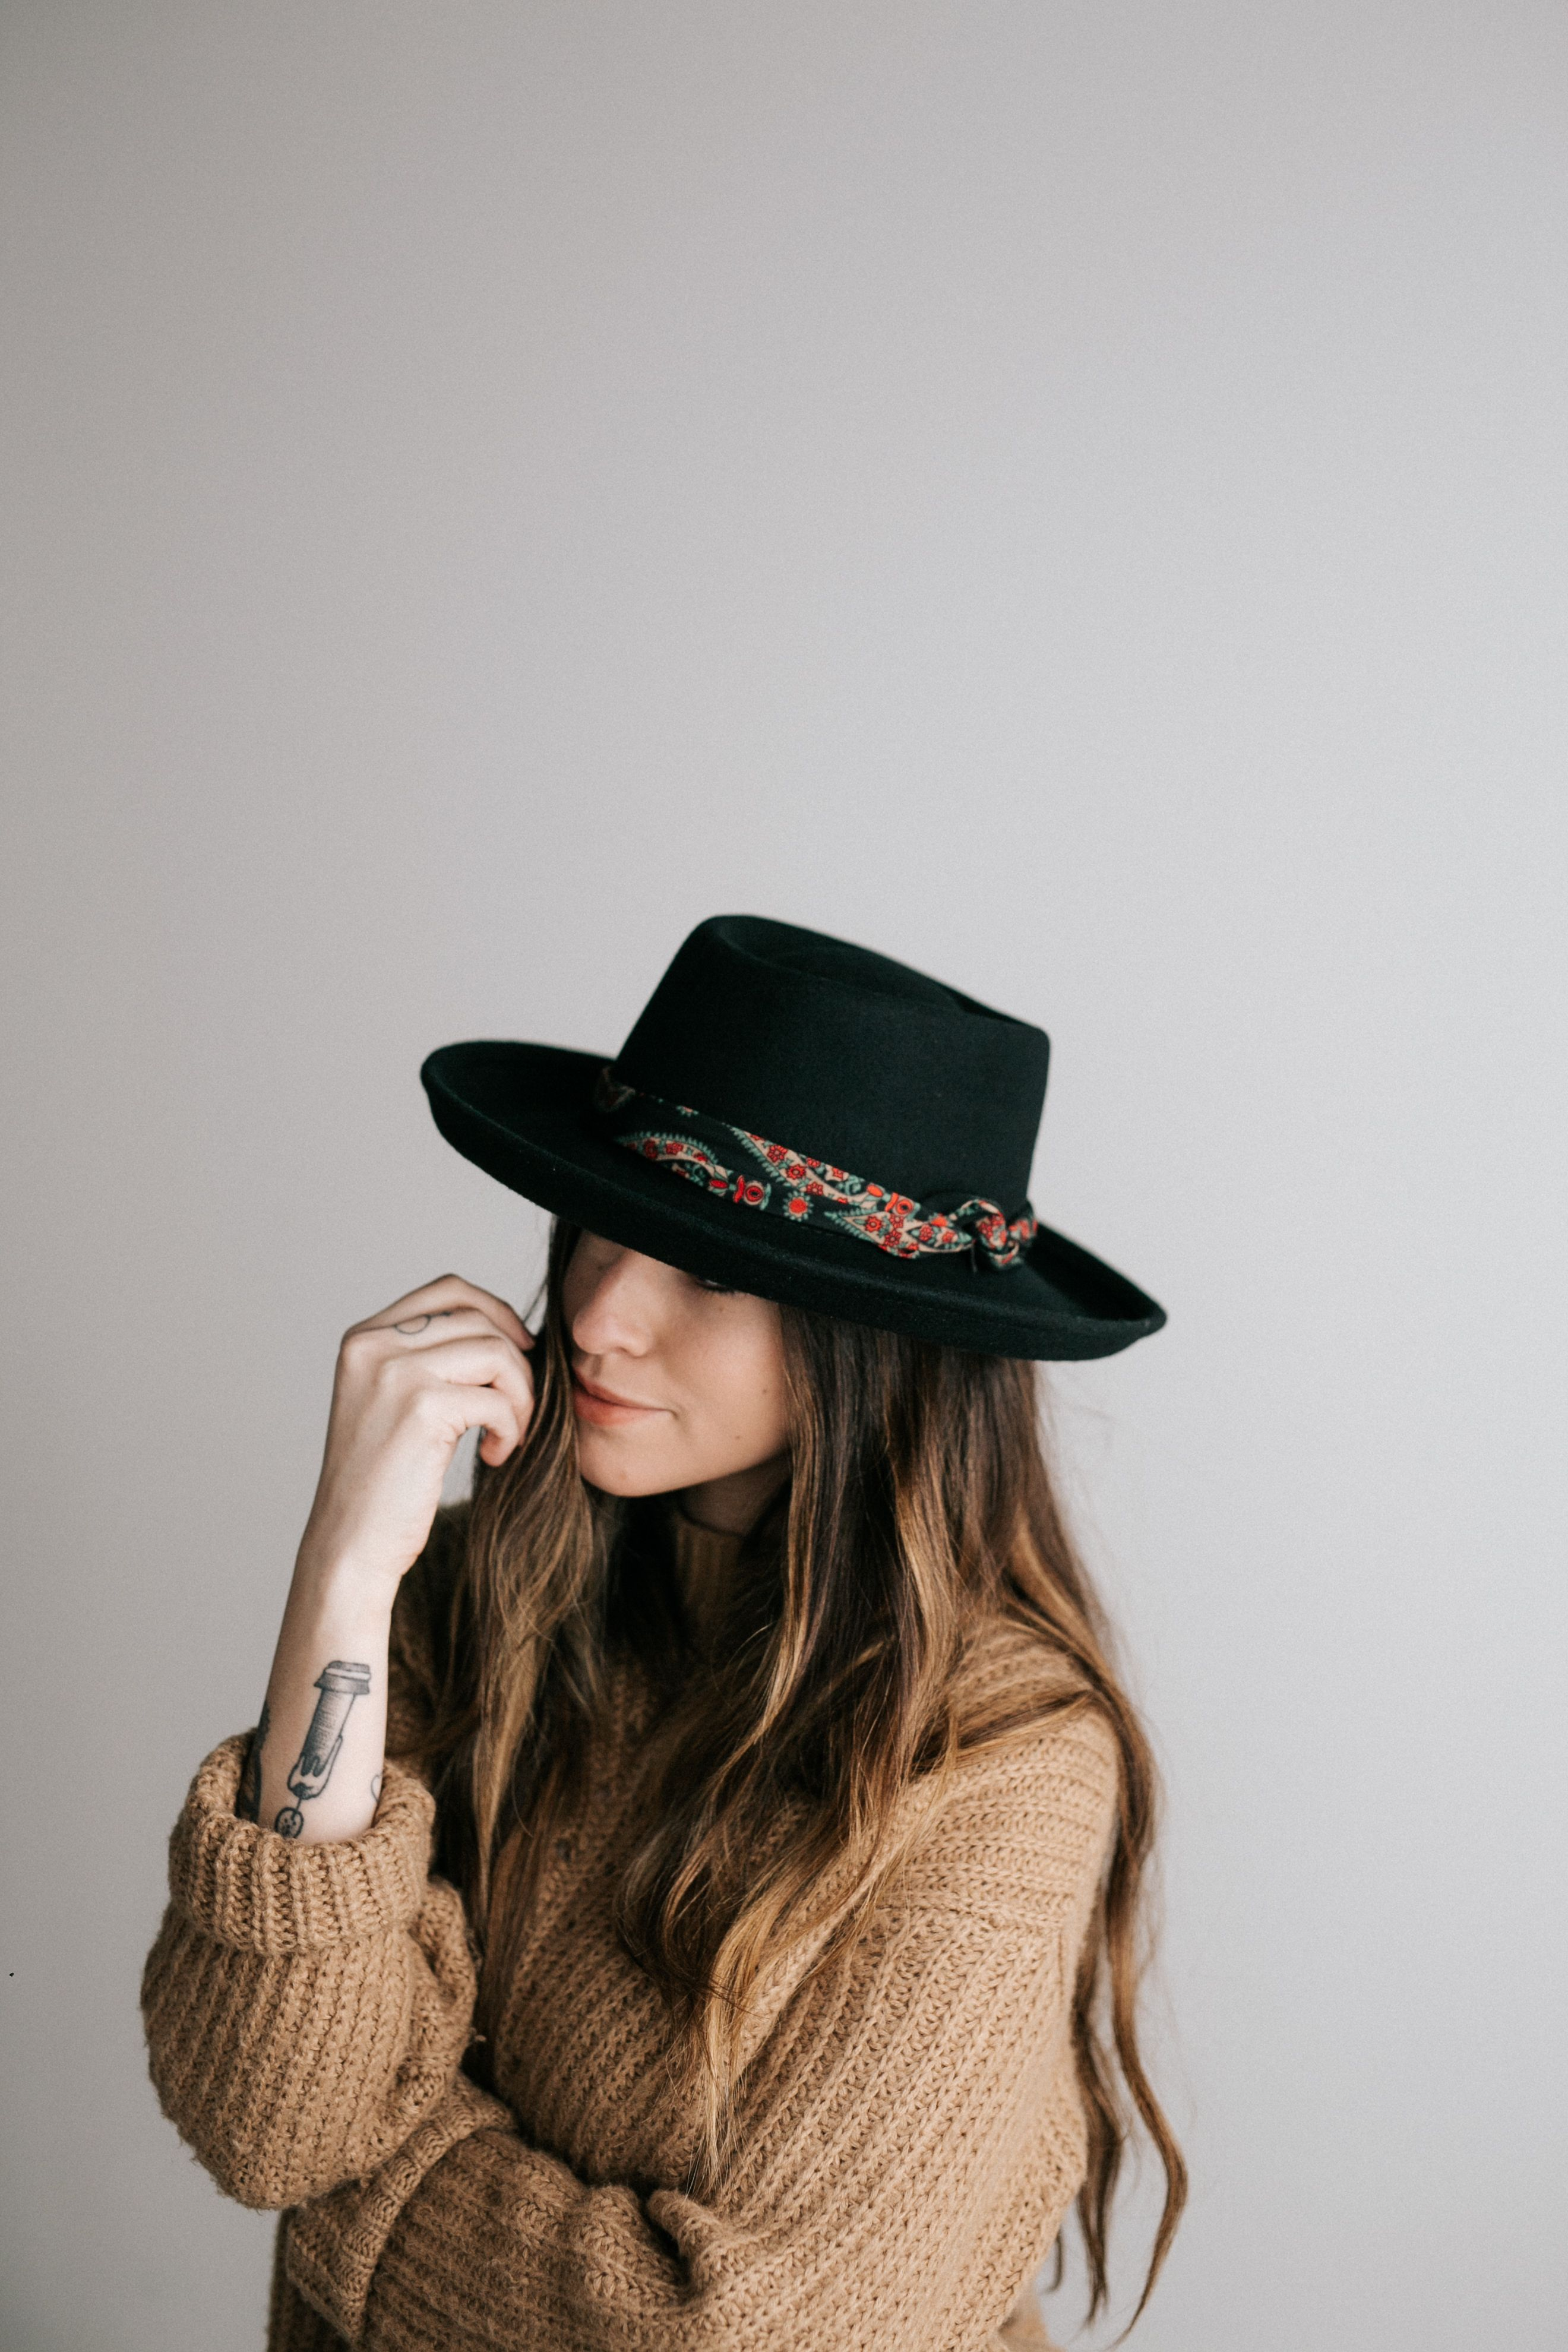 d10d541f Womens Hats   Hats for Women   GIGI PIP   felt hats for women. in ...